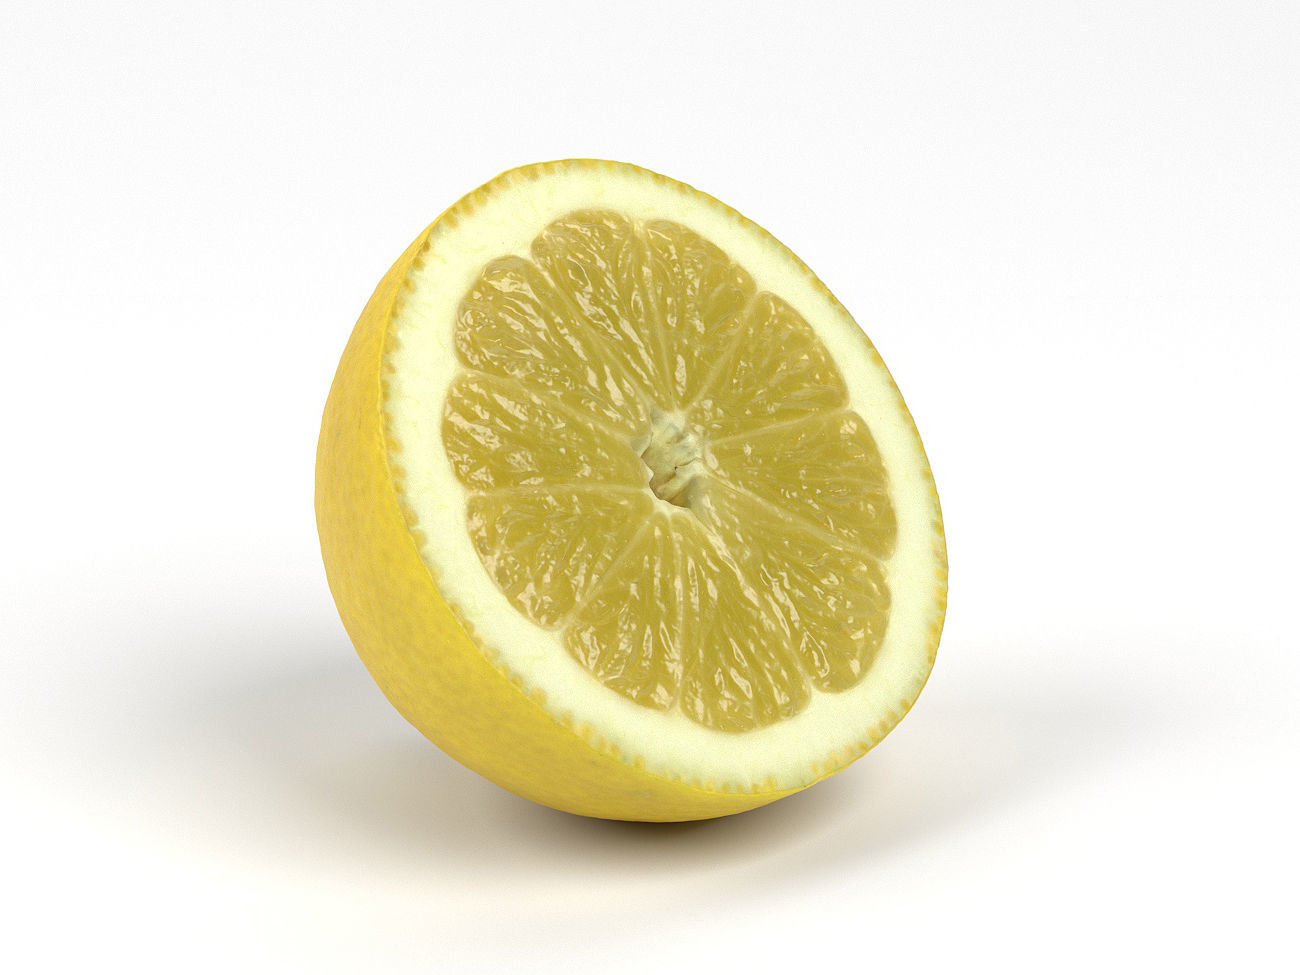 Photorealistic Lemon Half 3D Scan 4